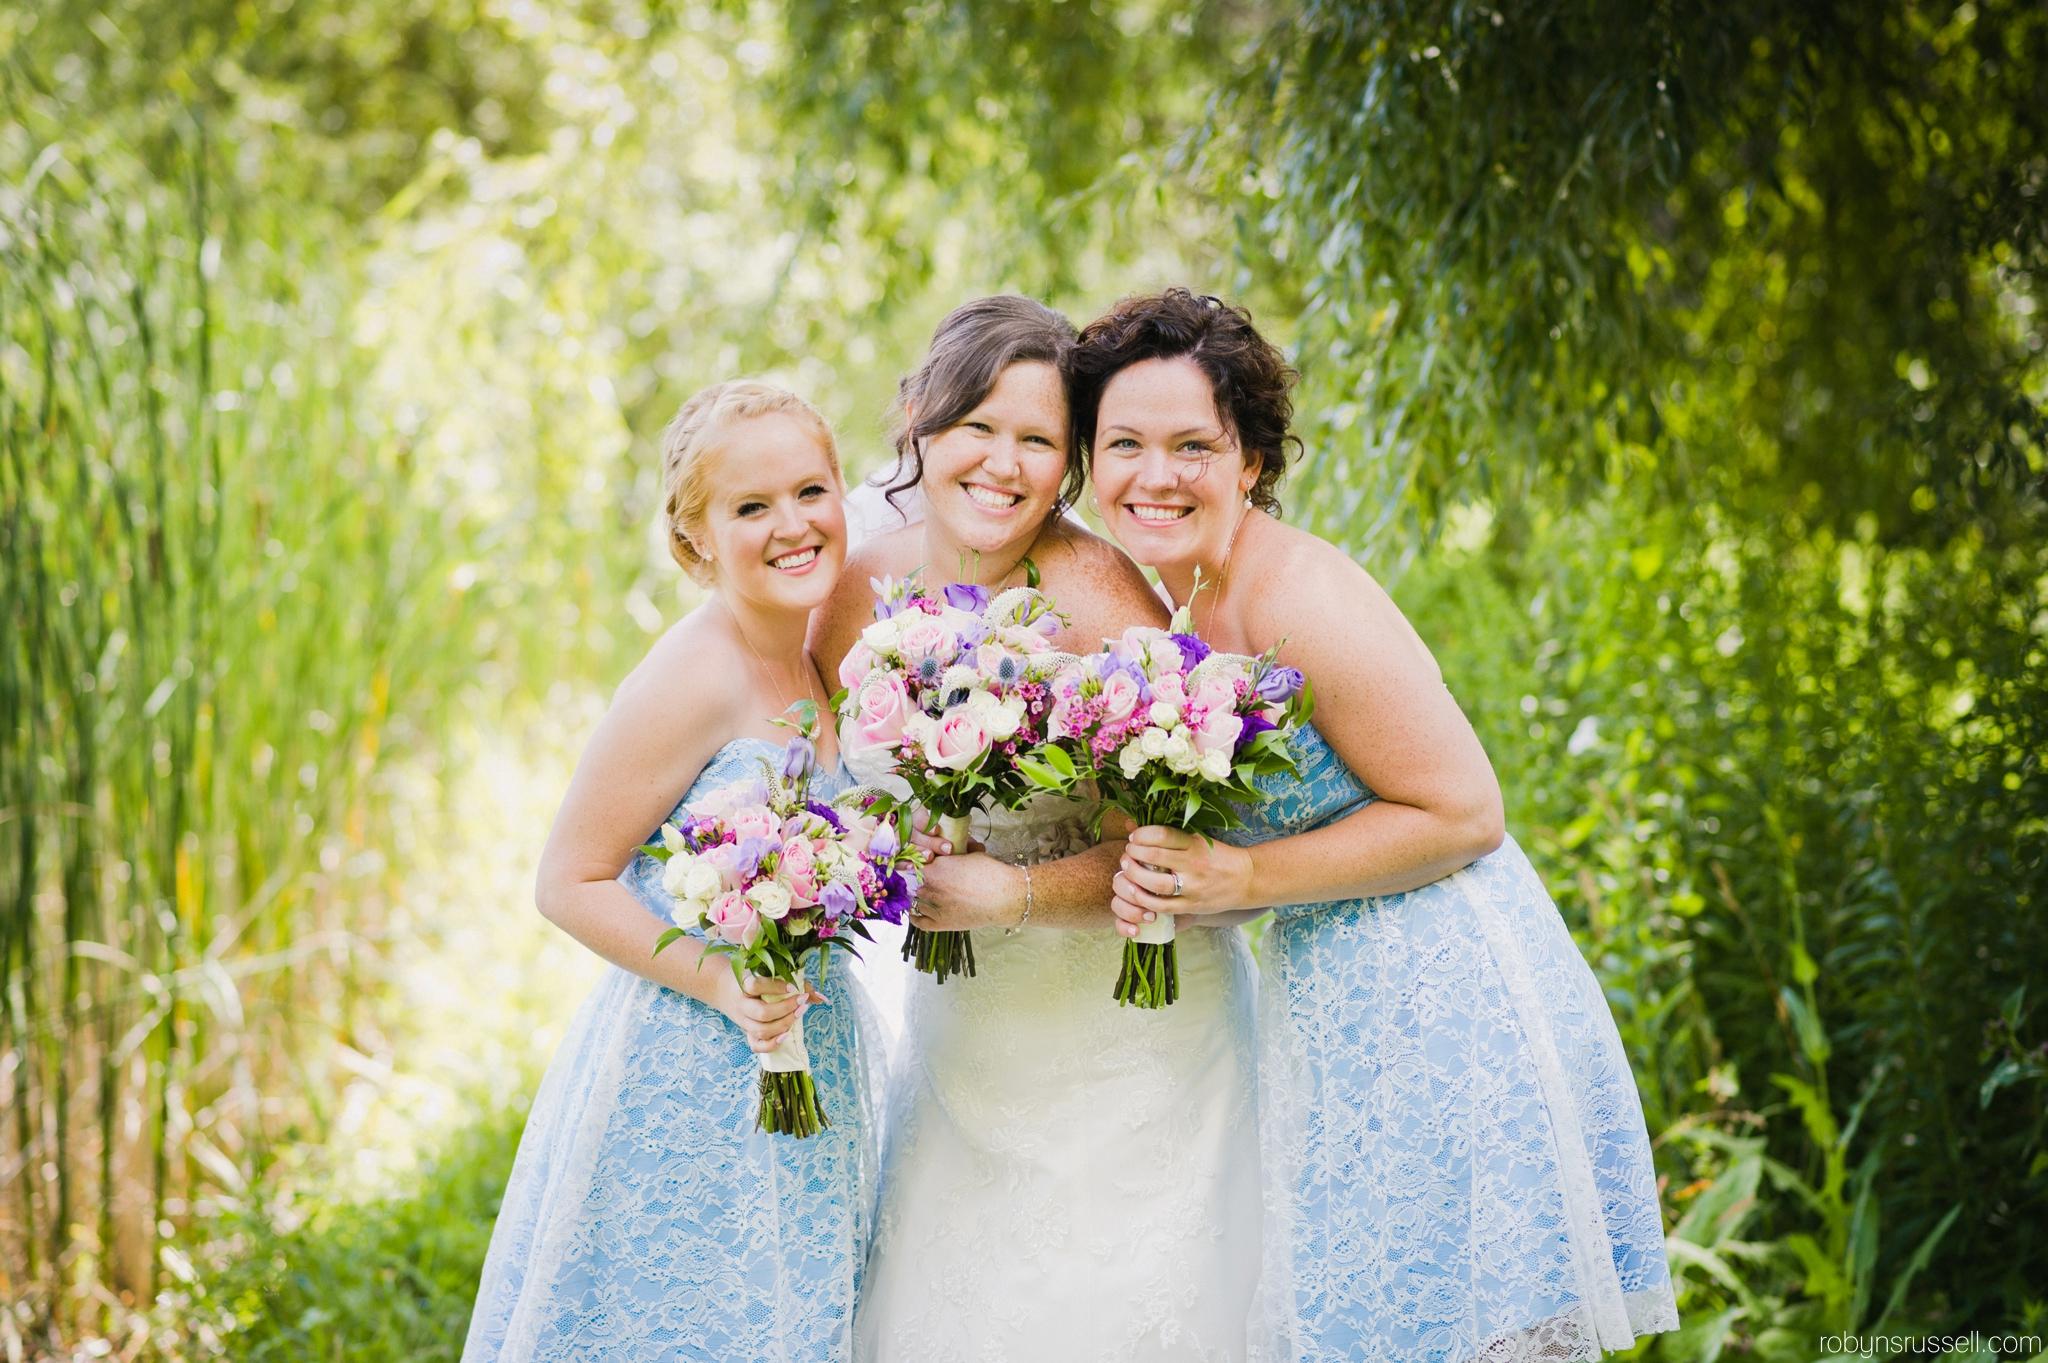 25-beautiful-bride-and-bridesmaids.jpg